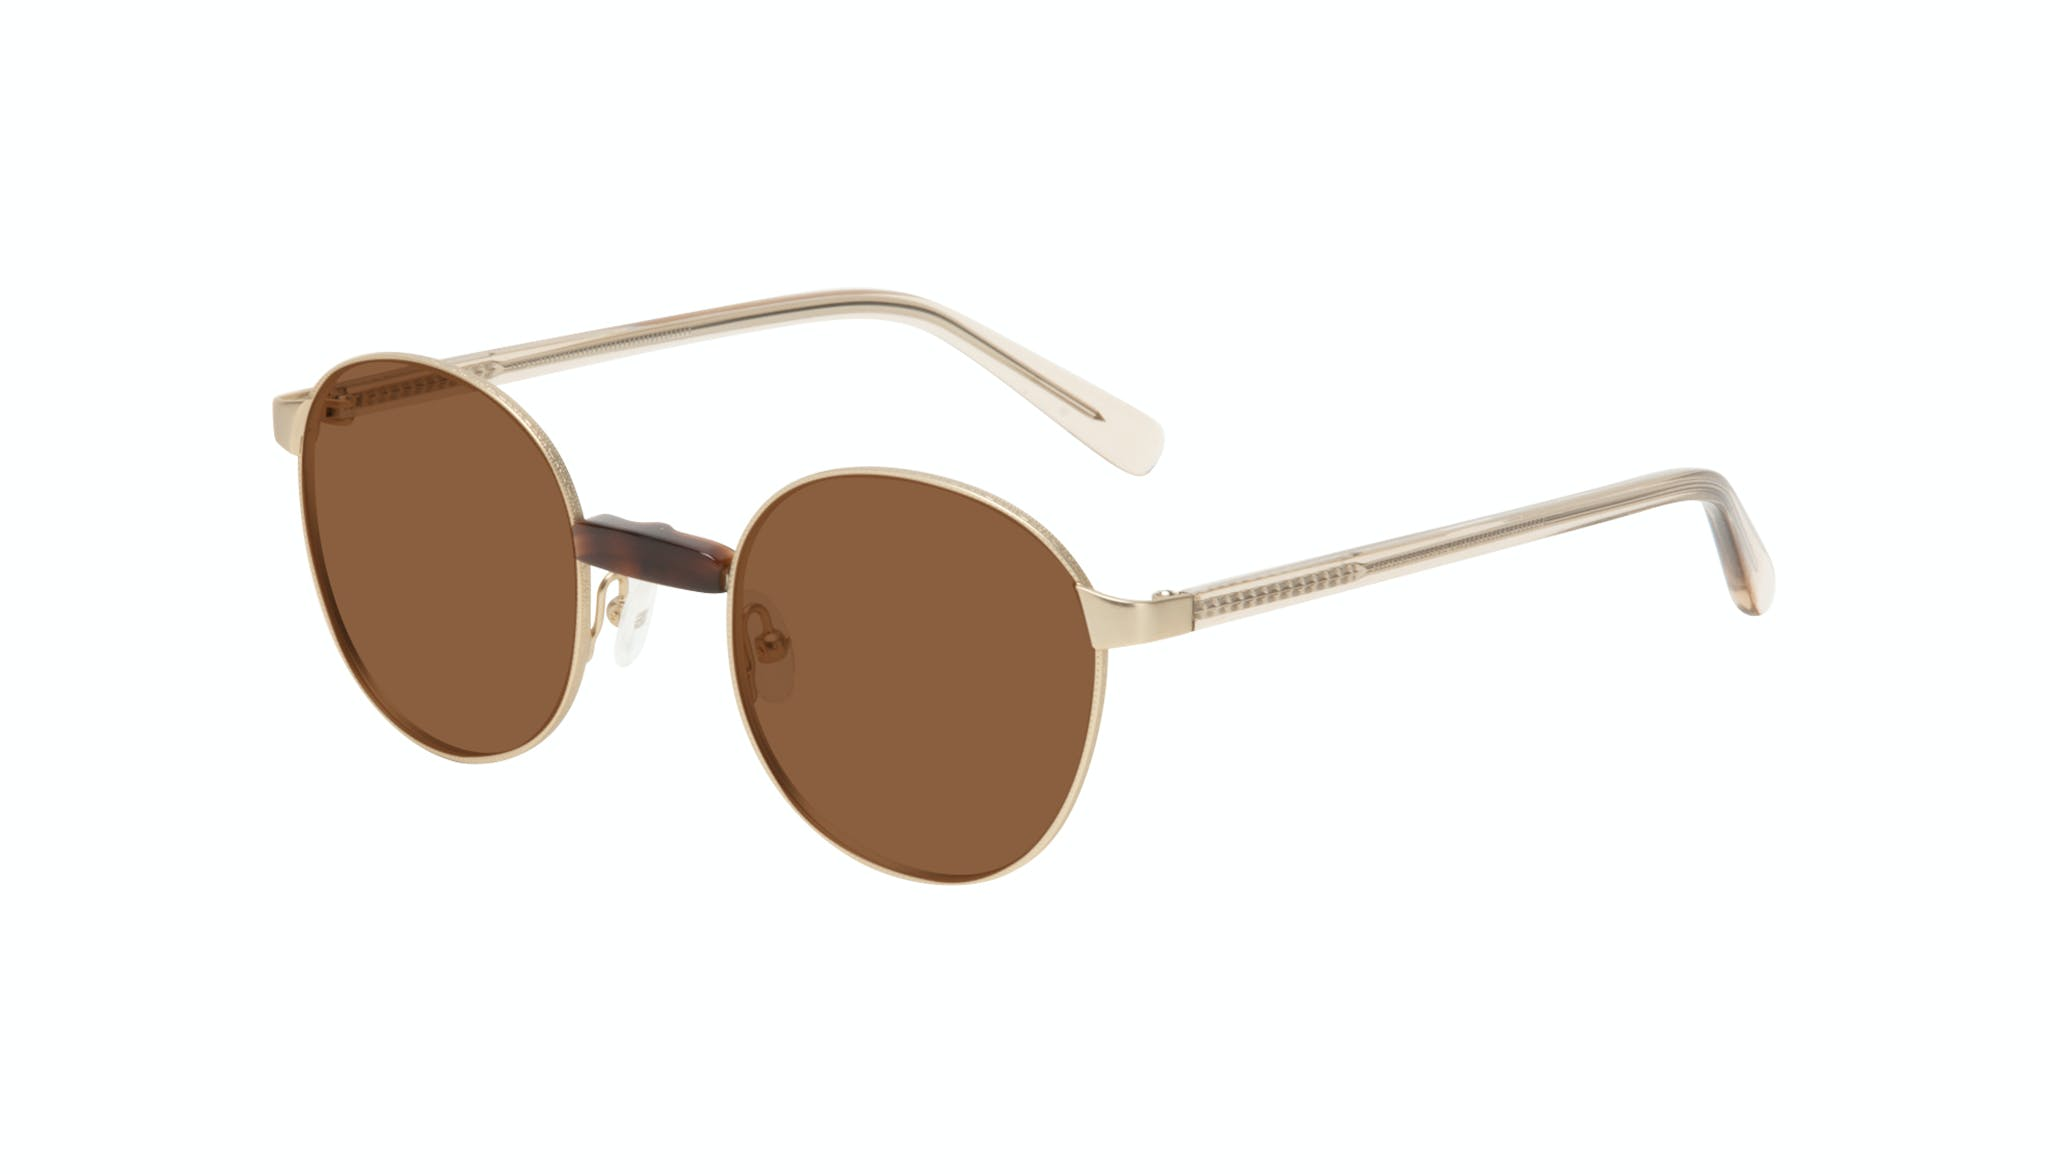 Affordable Fashion Glasses Round Sunglasses Women Curious Gold Tilt